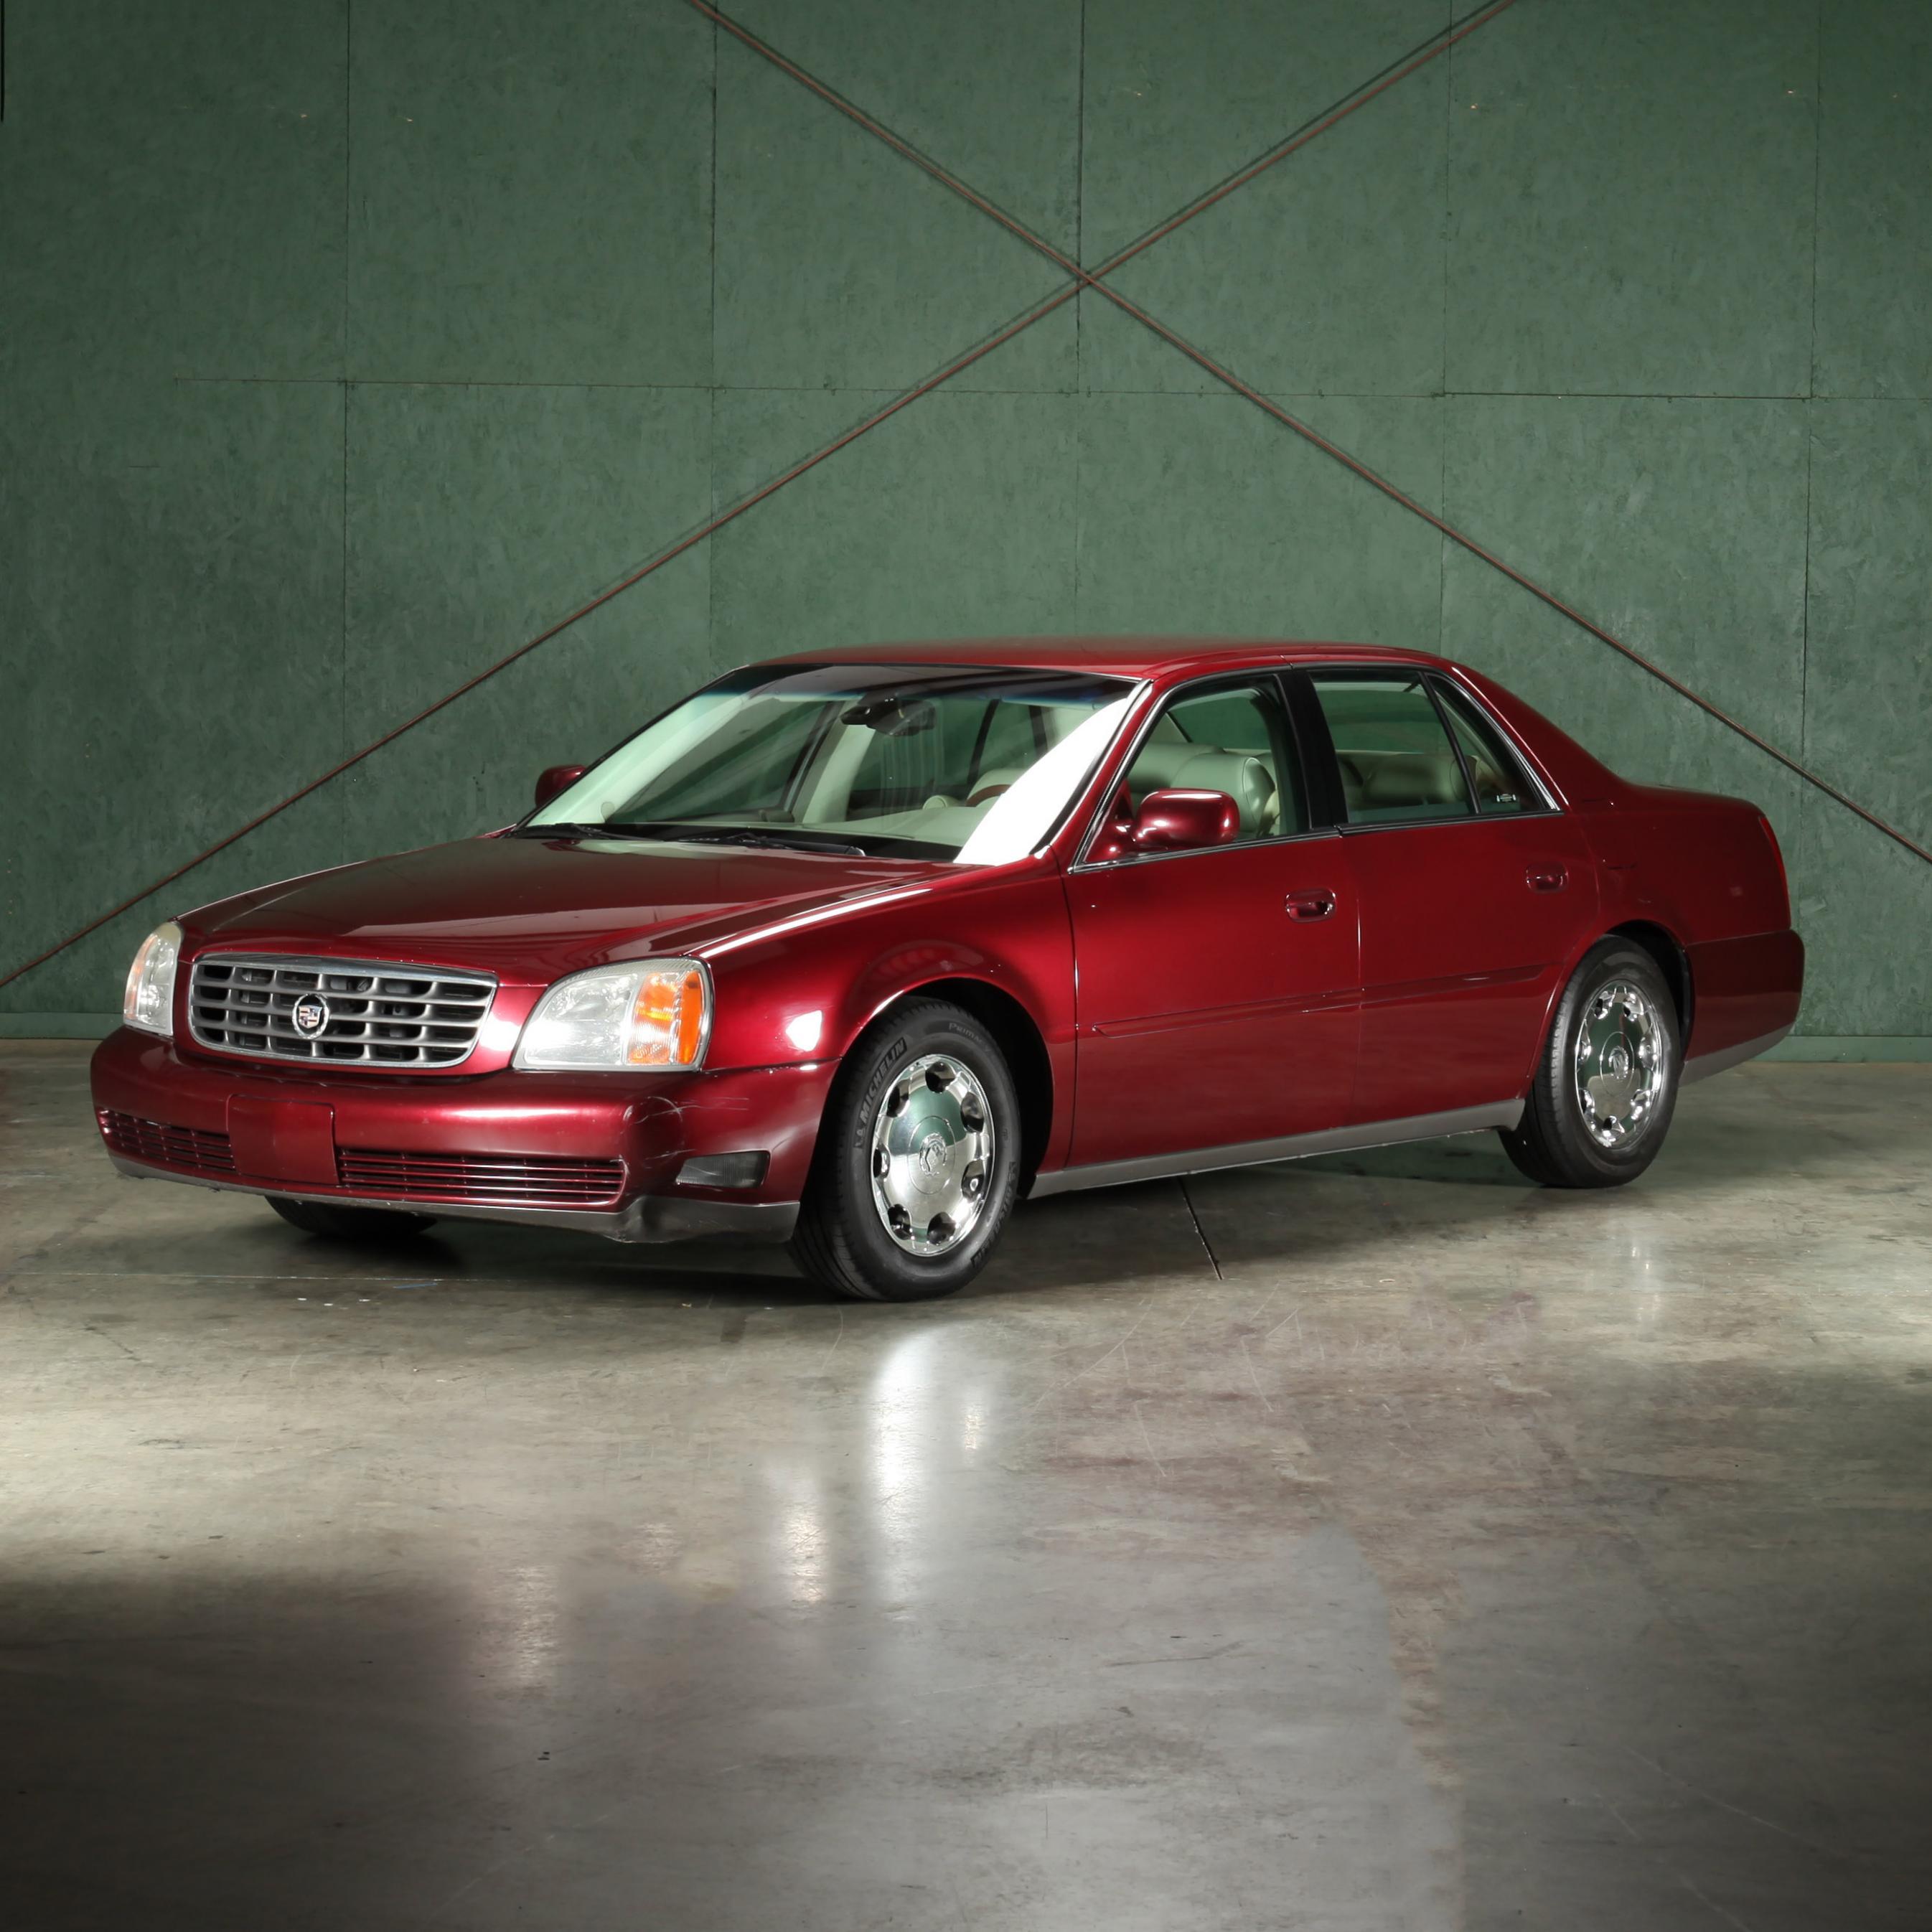 2002-cadillac-dts-sedan